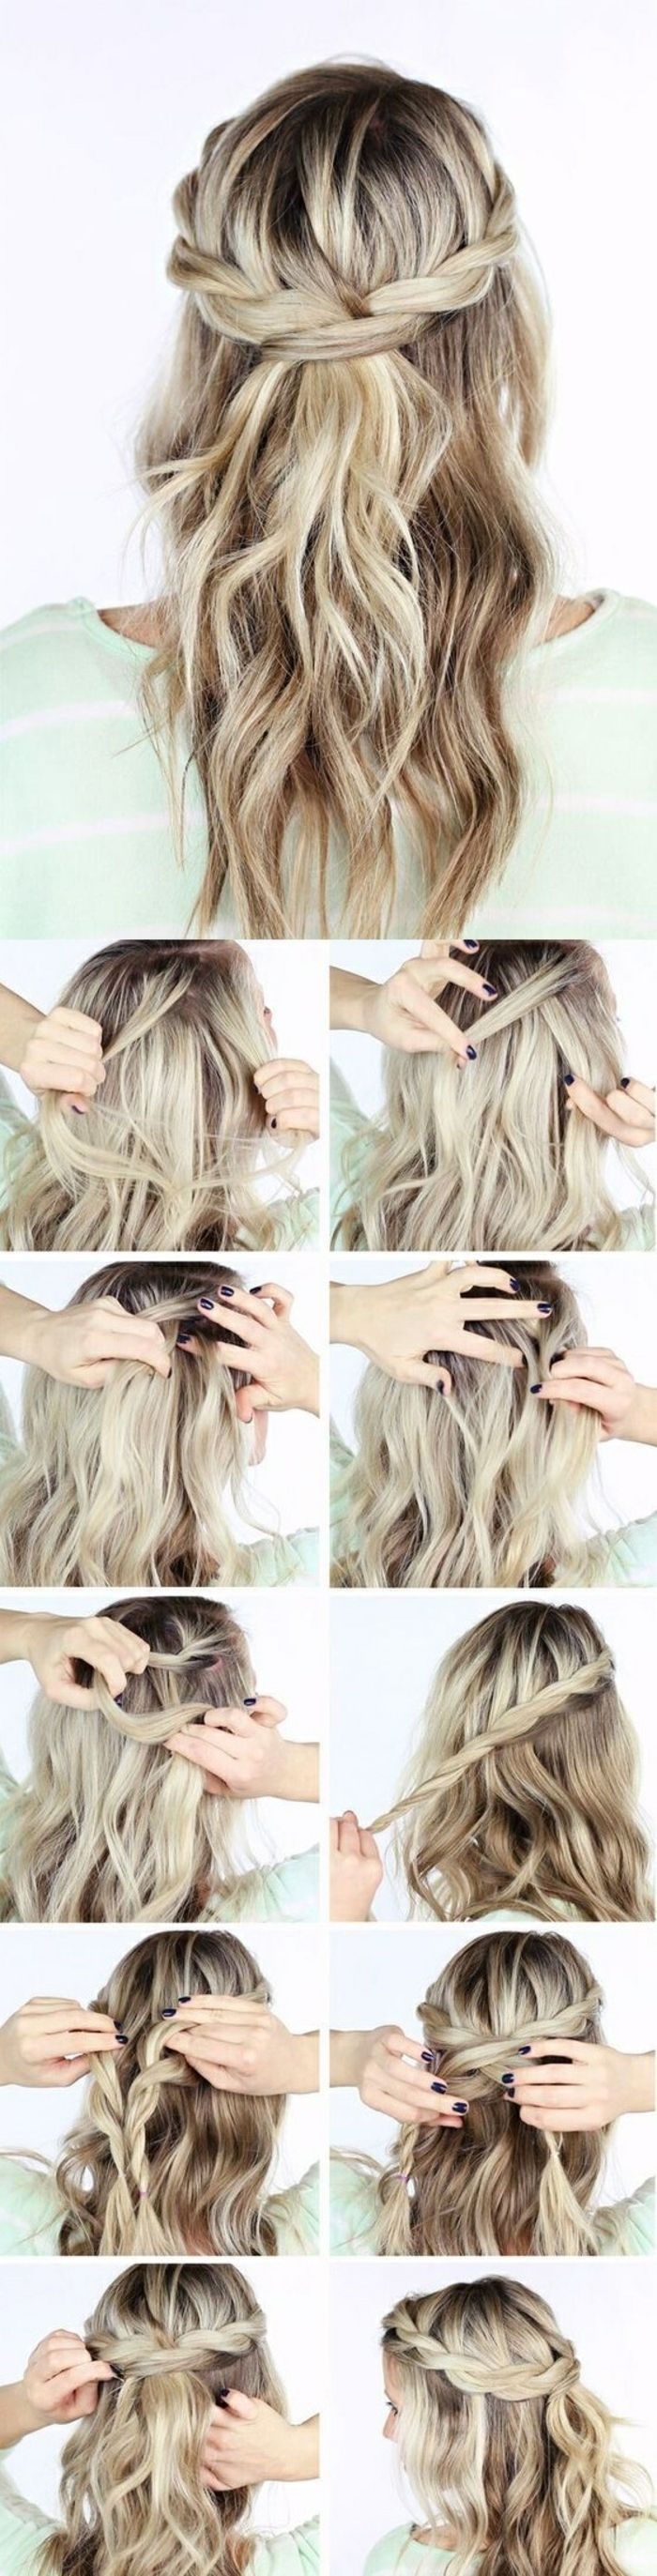 Einfache Frisuren Mittellange Blonde Lockige Haare Tolle Flechtfrisur Beauty Sac Kendin Yap Sac Modelleri Kolay Sac Modelleri